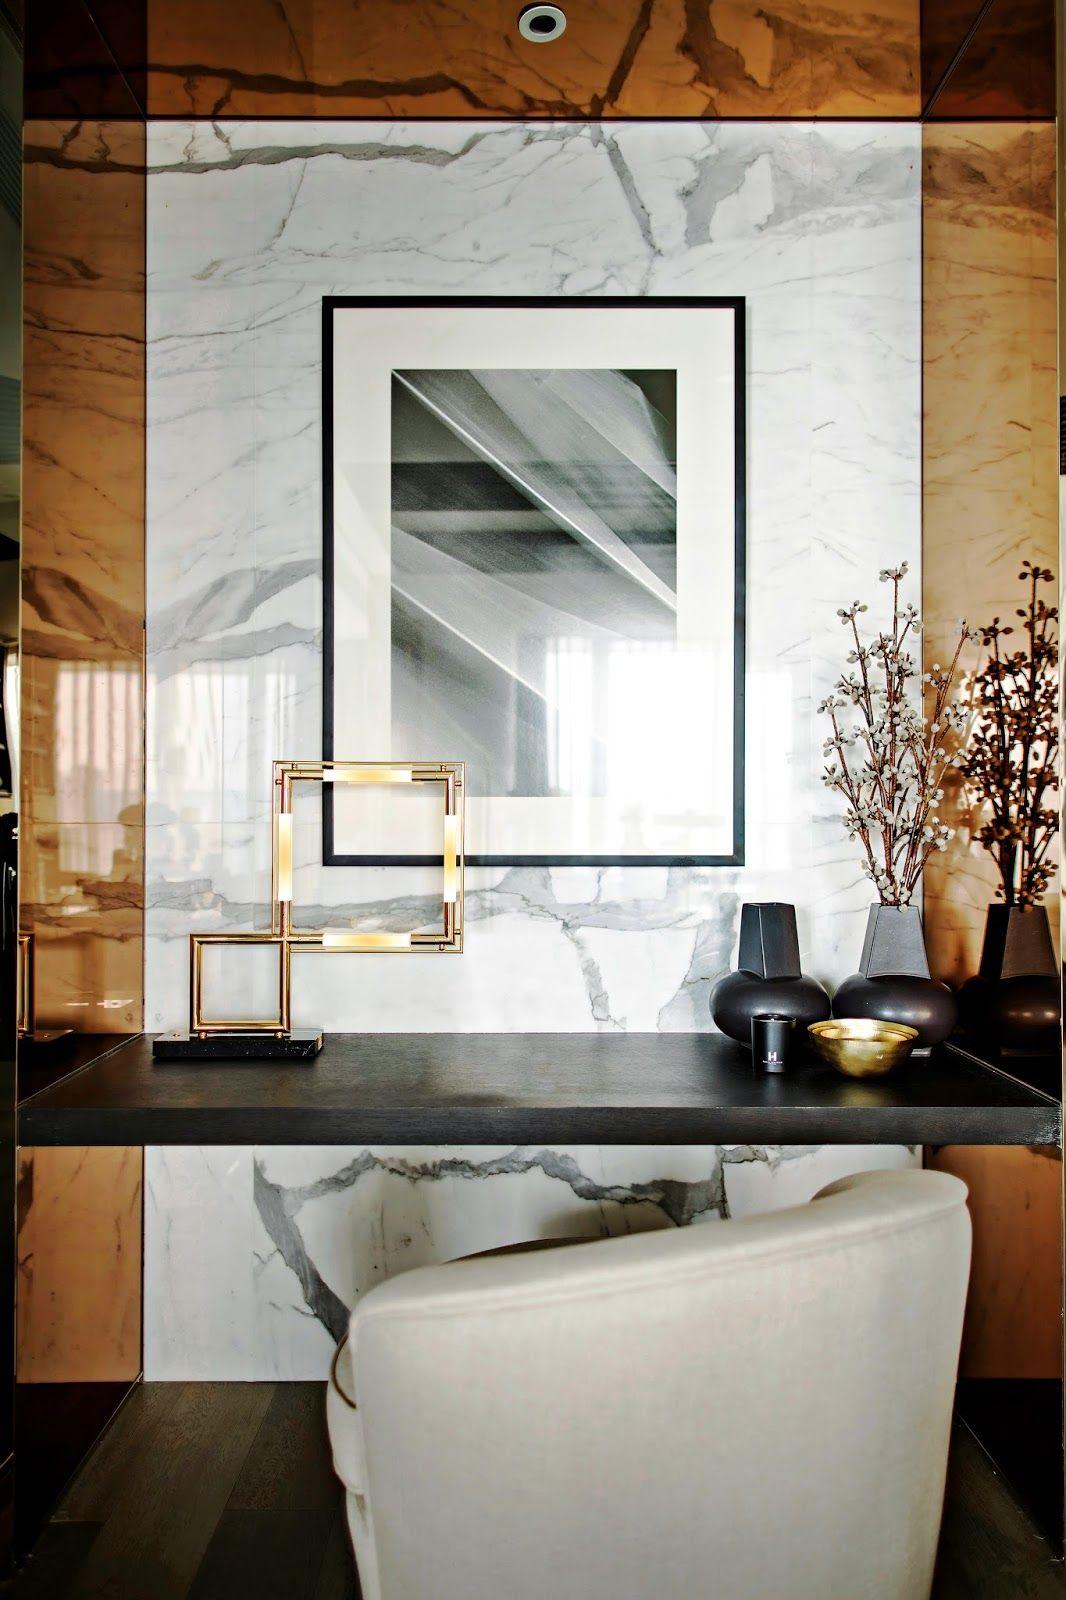 kelly hoppen the art of interior design by kelly hoppen rizzoli new rh pinterest com